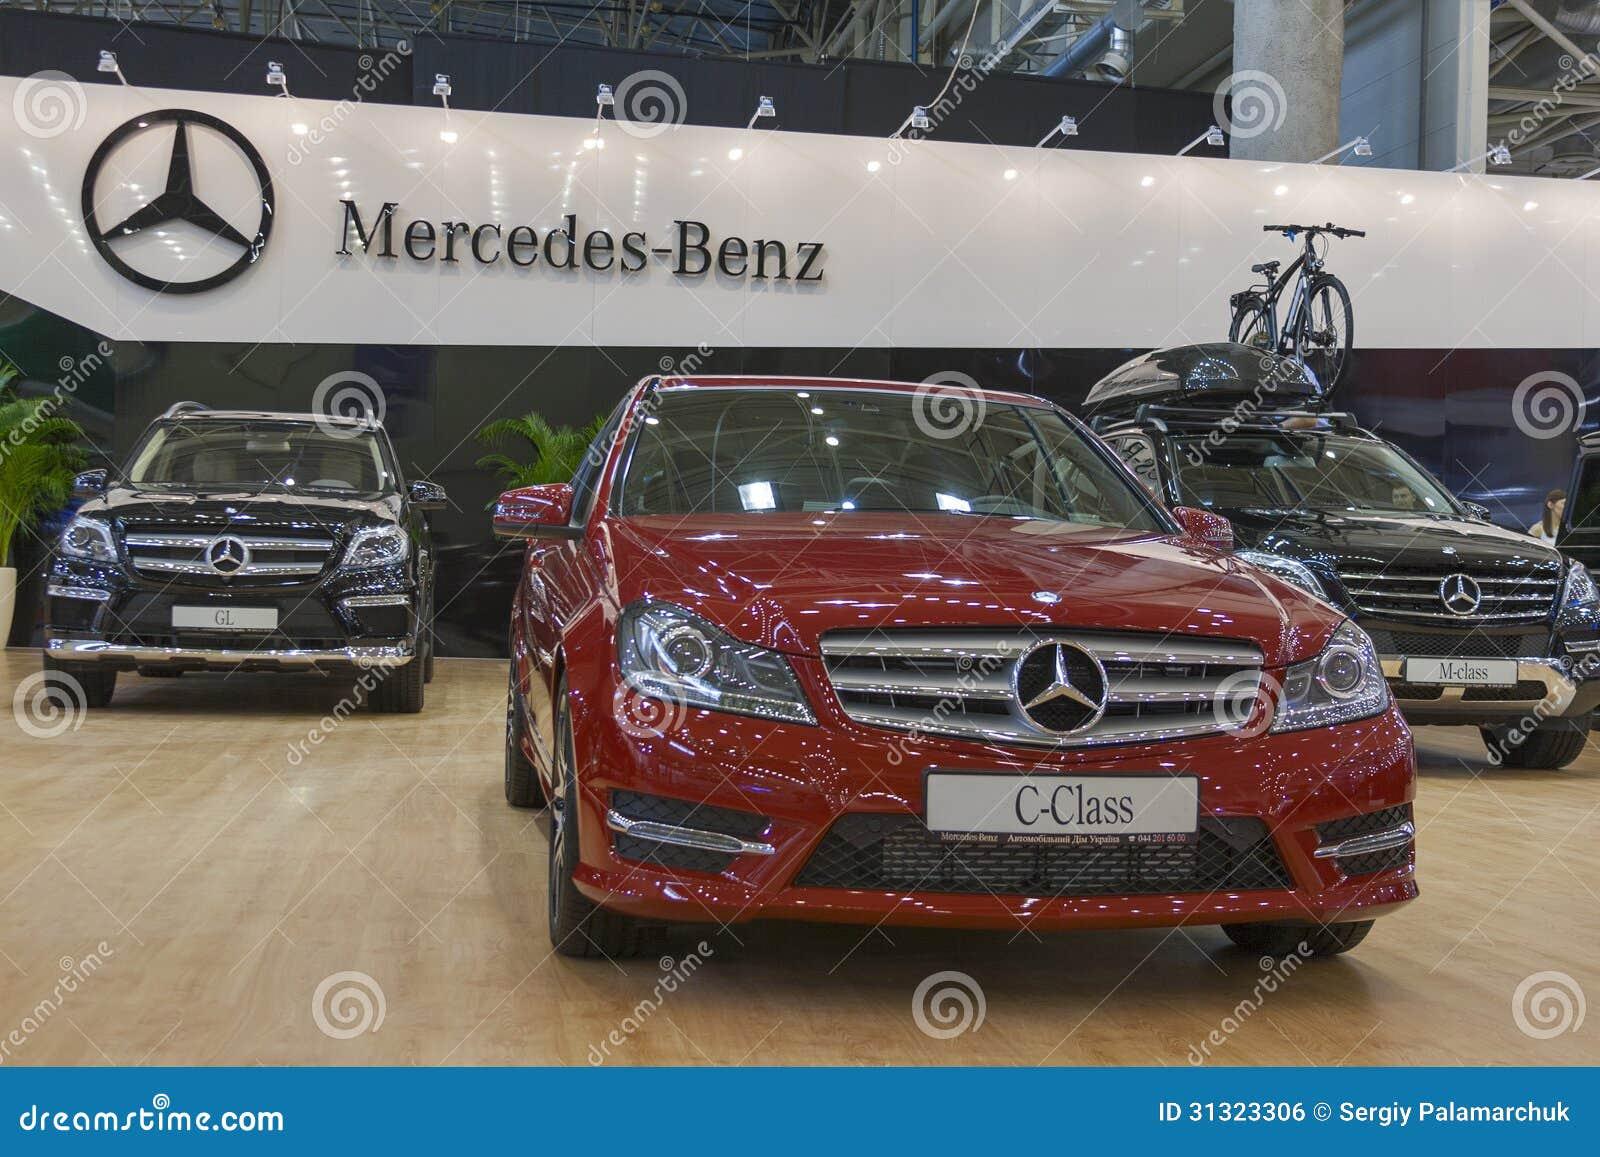 Mercedes-Benz Car Models On Display Editorial Photo ...